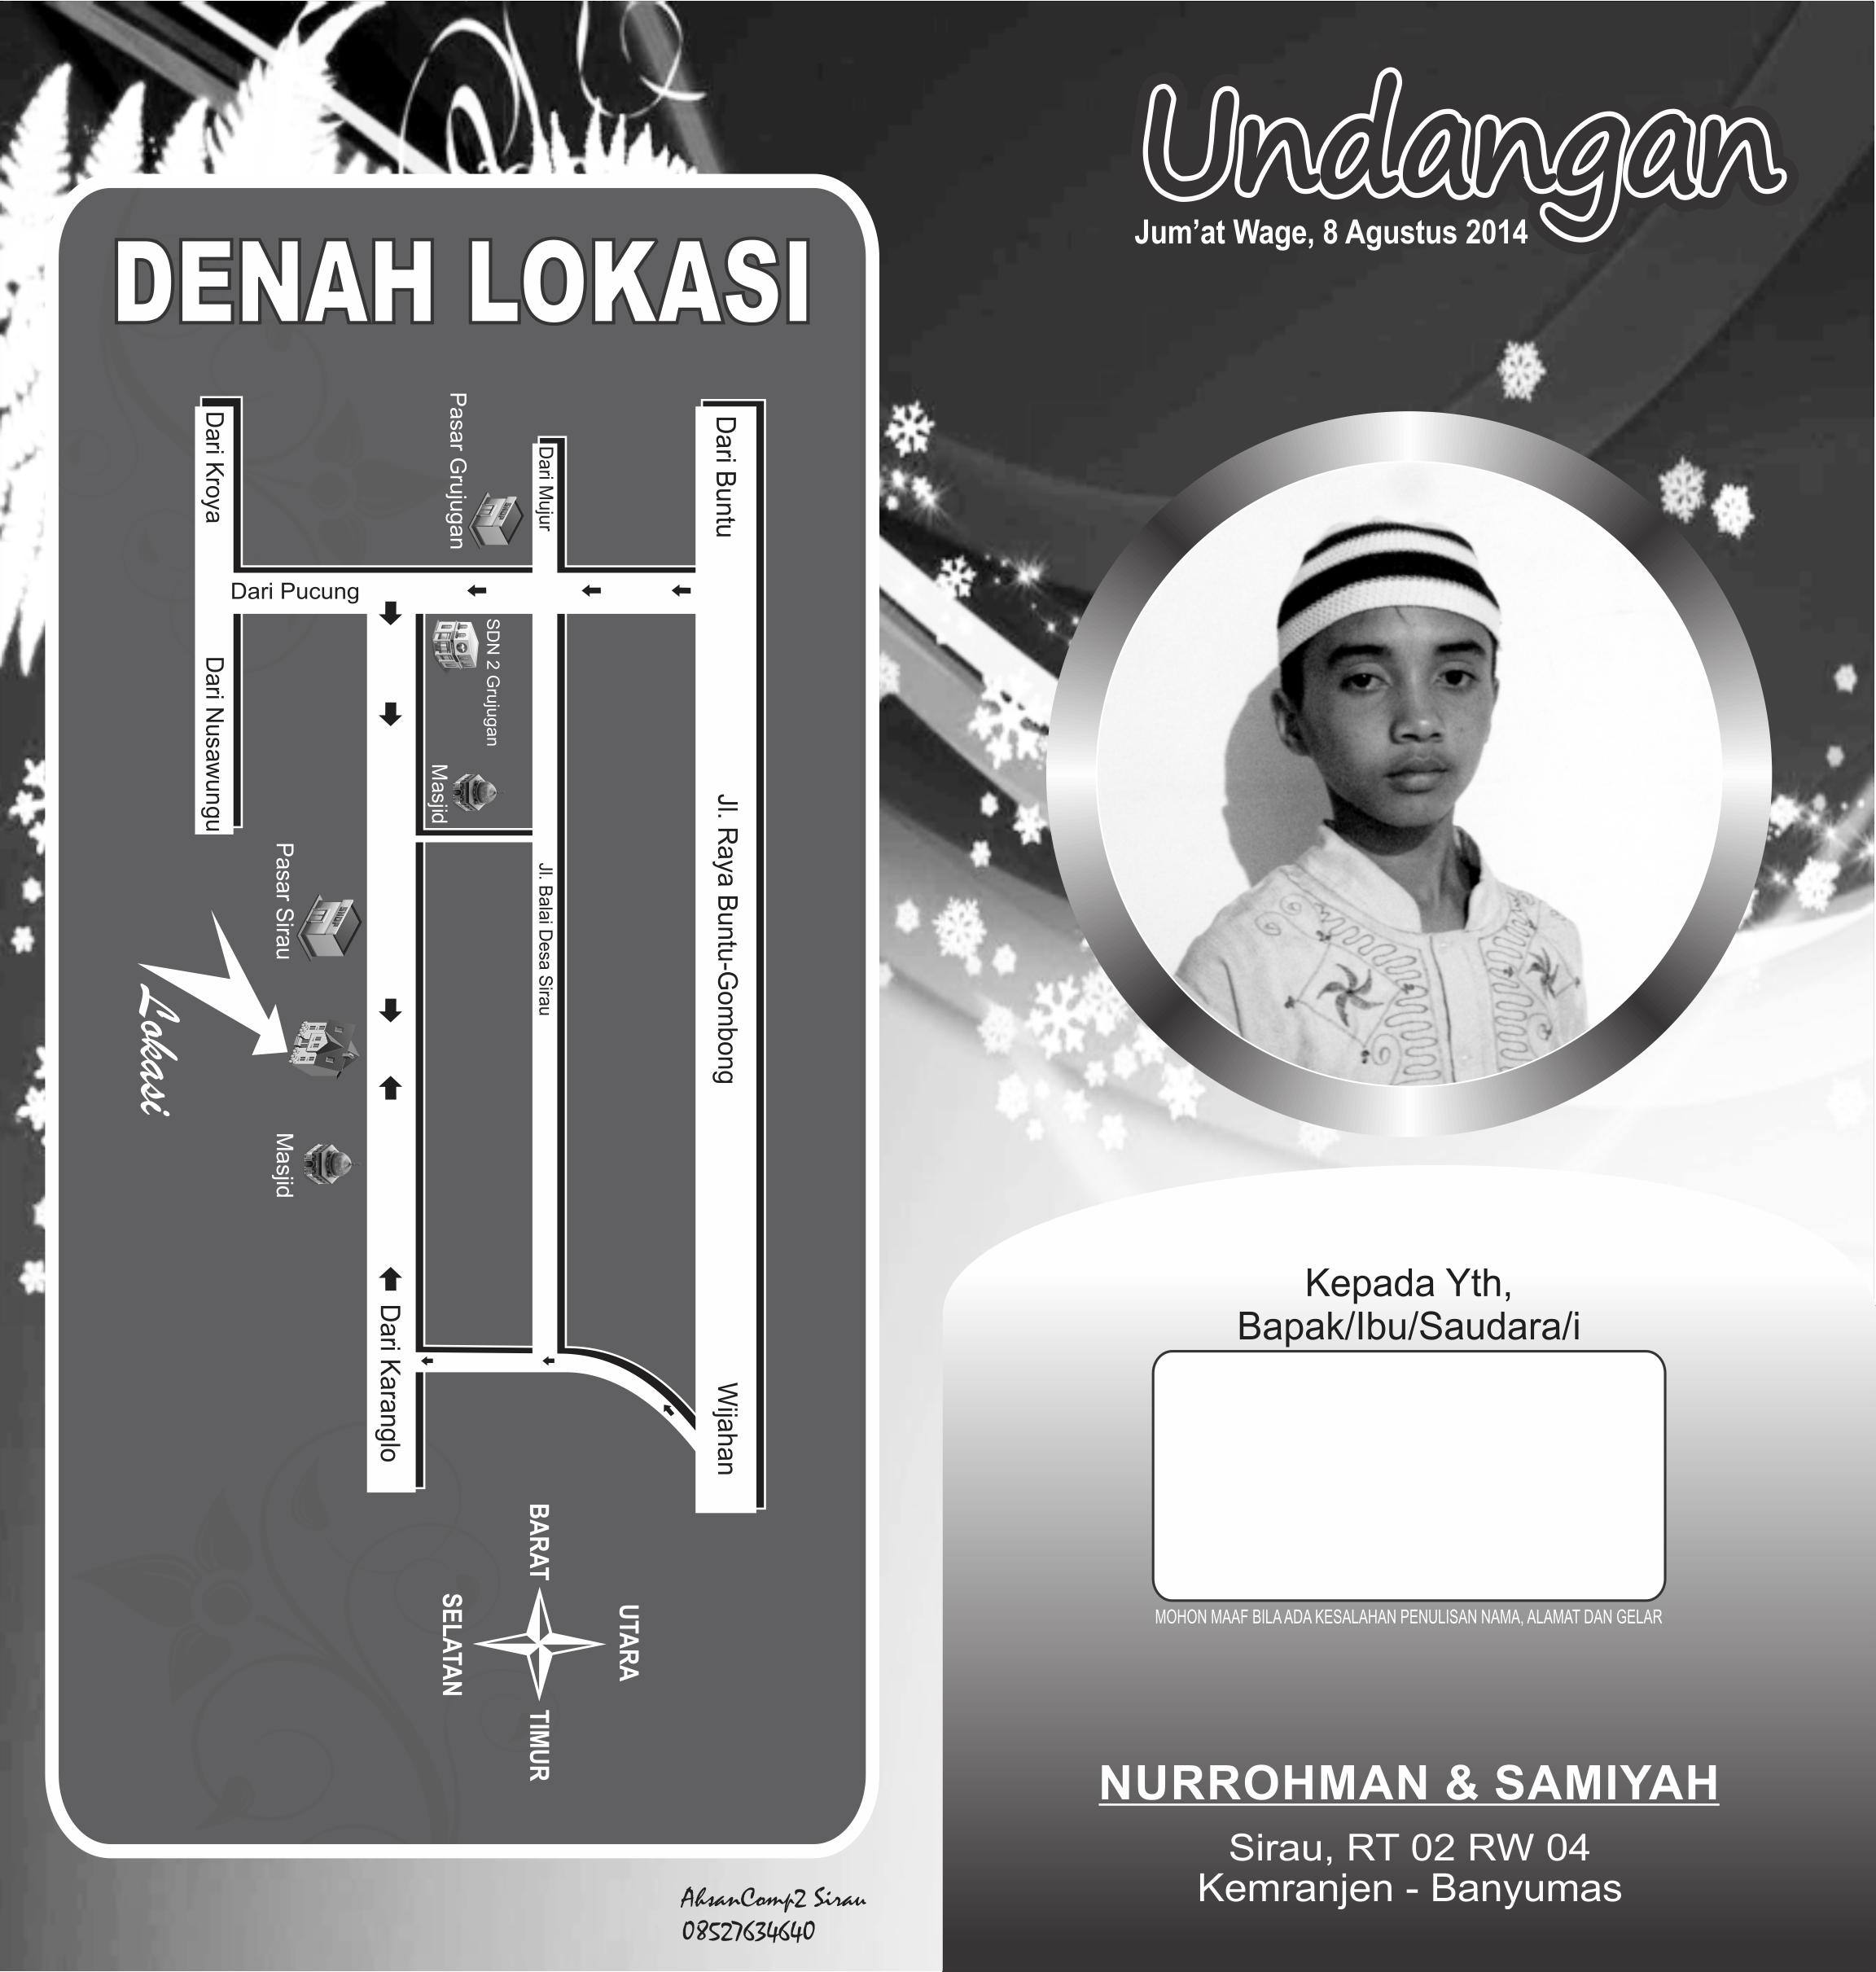 Desain Undangan Sunat Khitan Gratis Cdr Free Banner Design Cdr